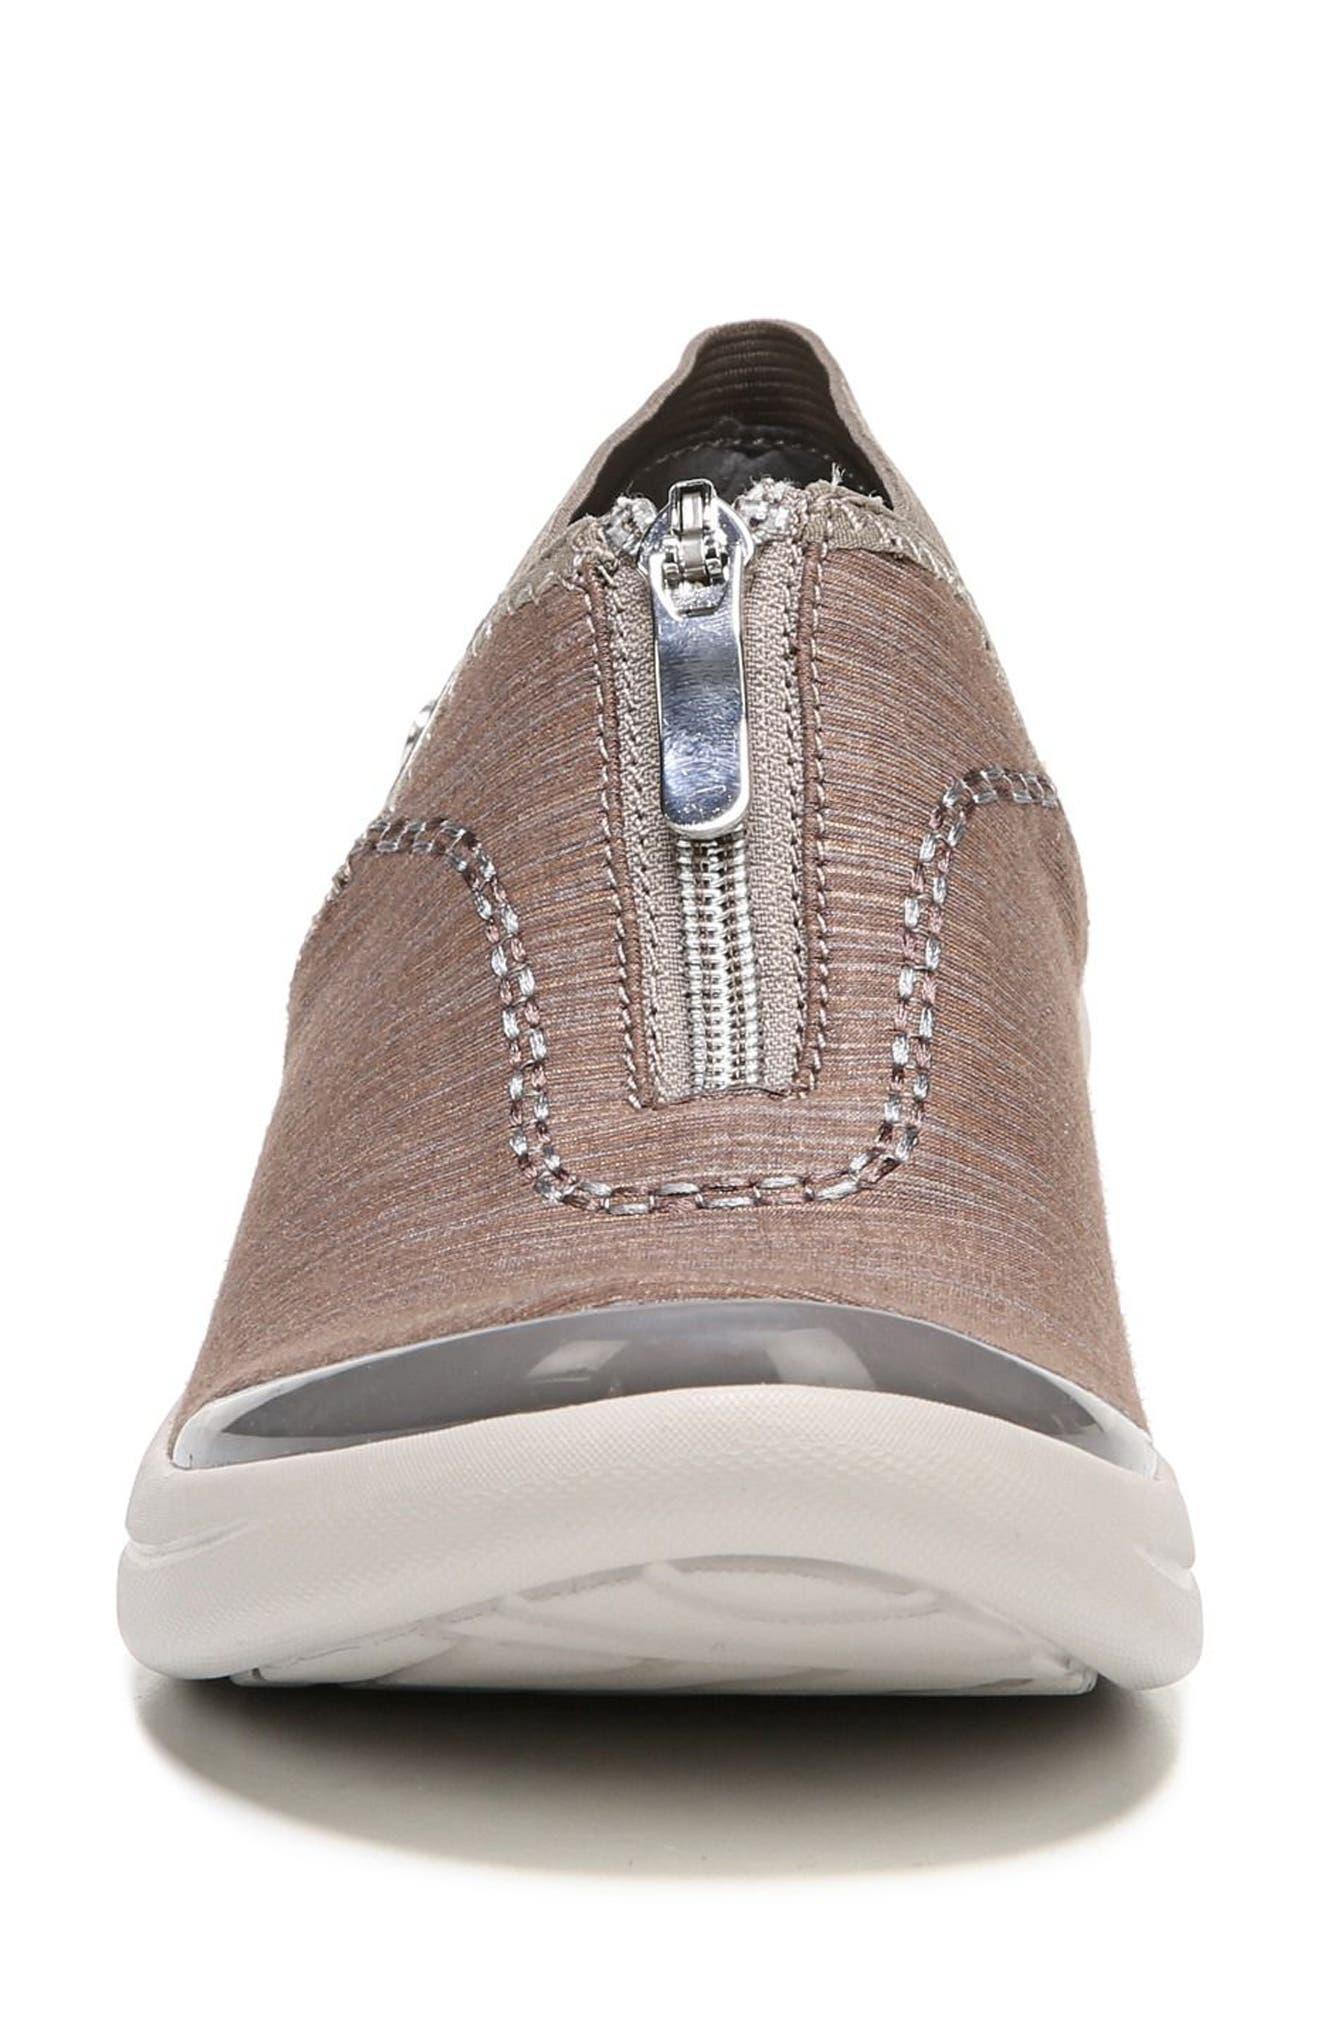 BZEES, Fling Wedge Sneaker, Alternate thumbnail 4, color, BROWN FABRIC